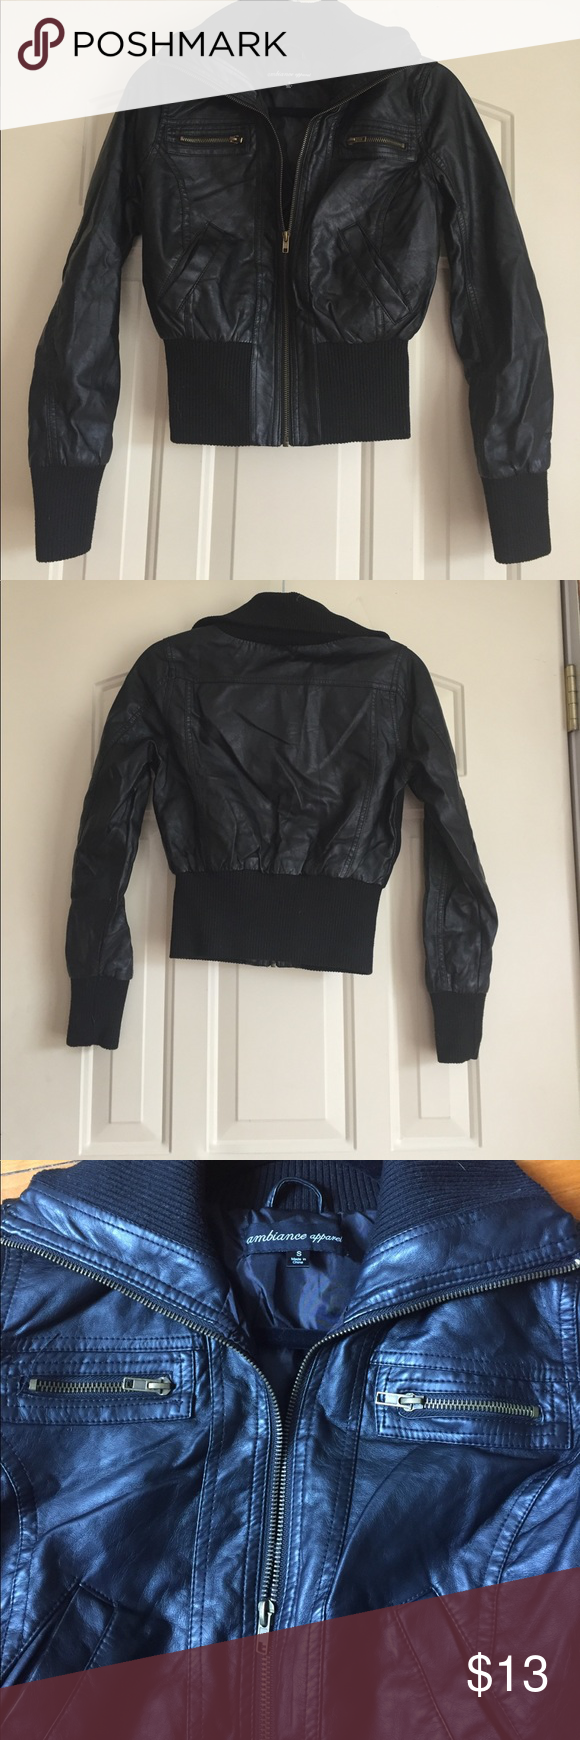 Bomber Jacket Hardly Used No Signs Of Wear Ambiance Jackets Coats Bomber Jacket Clothes Design Jackets [ 1740 x 580 Pixel ]